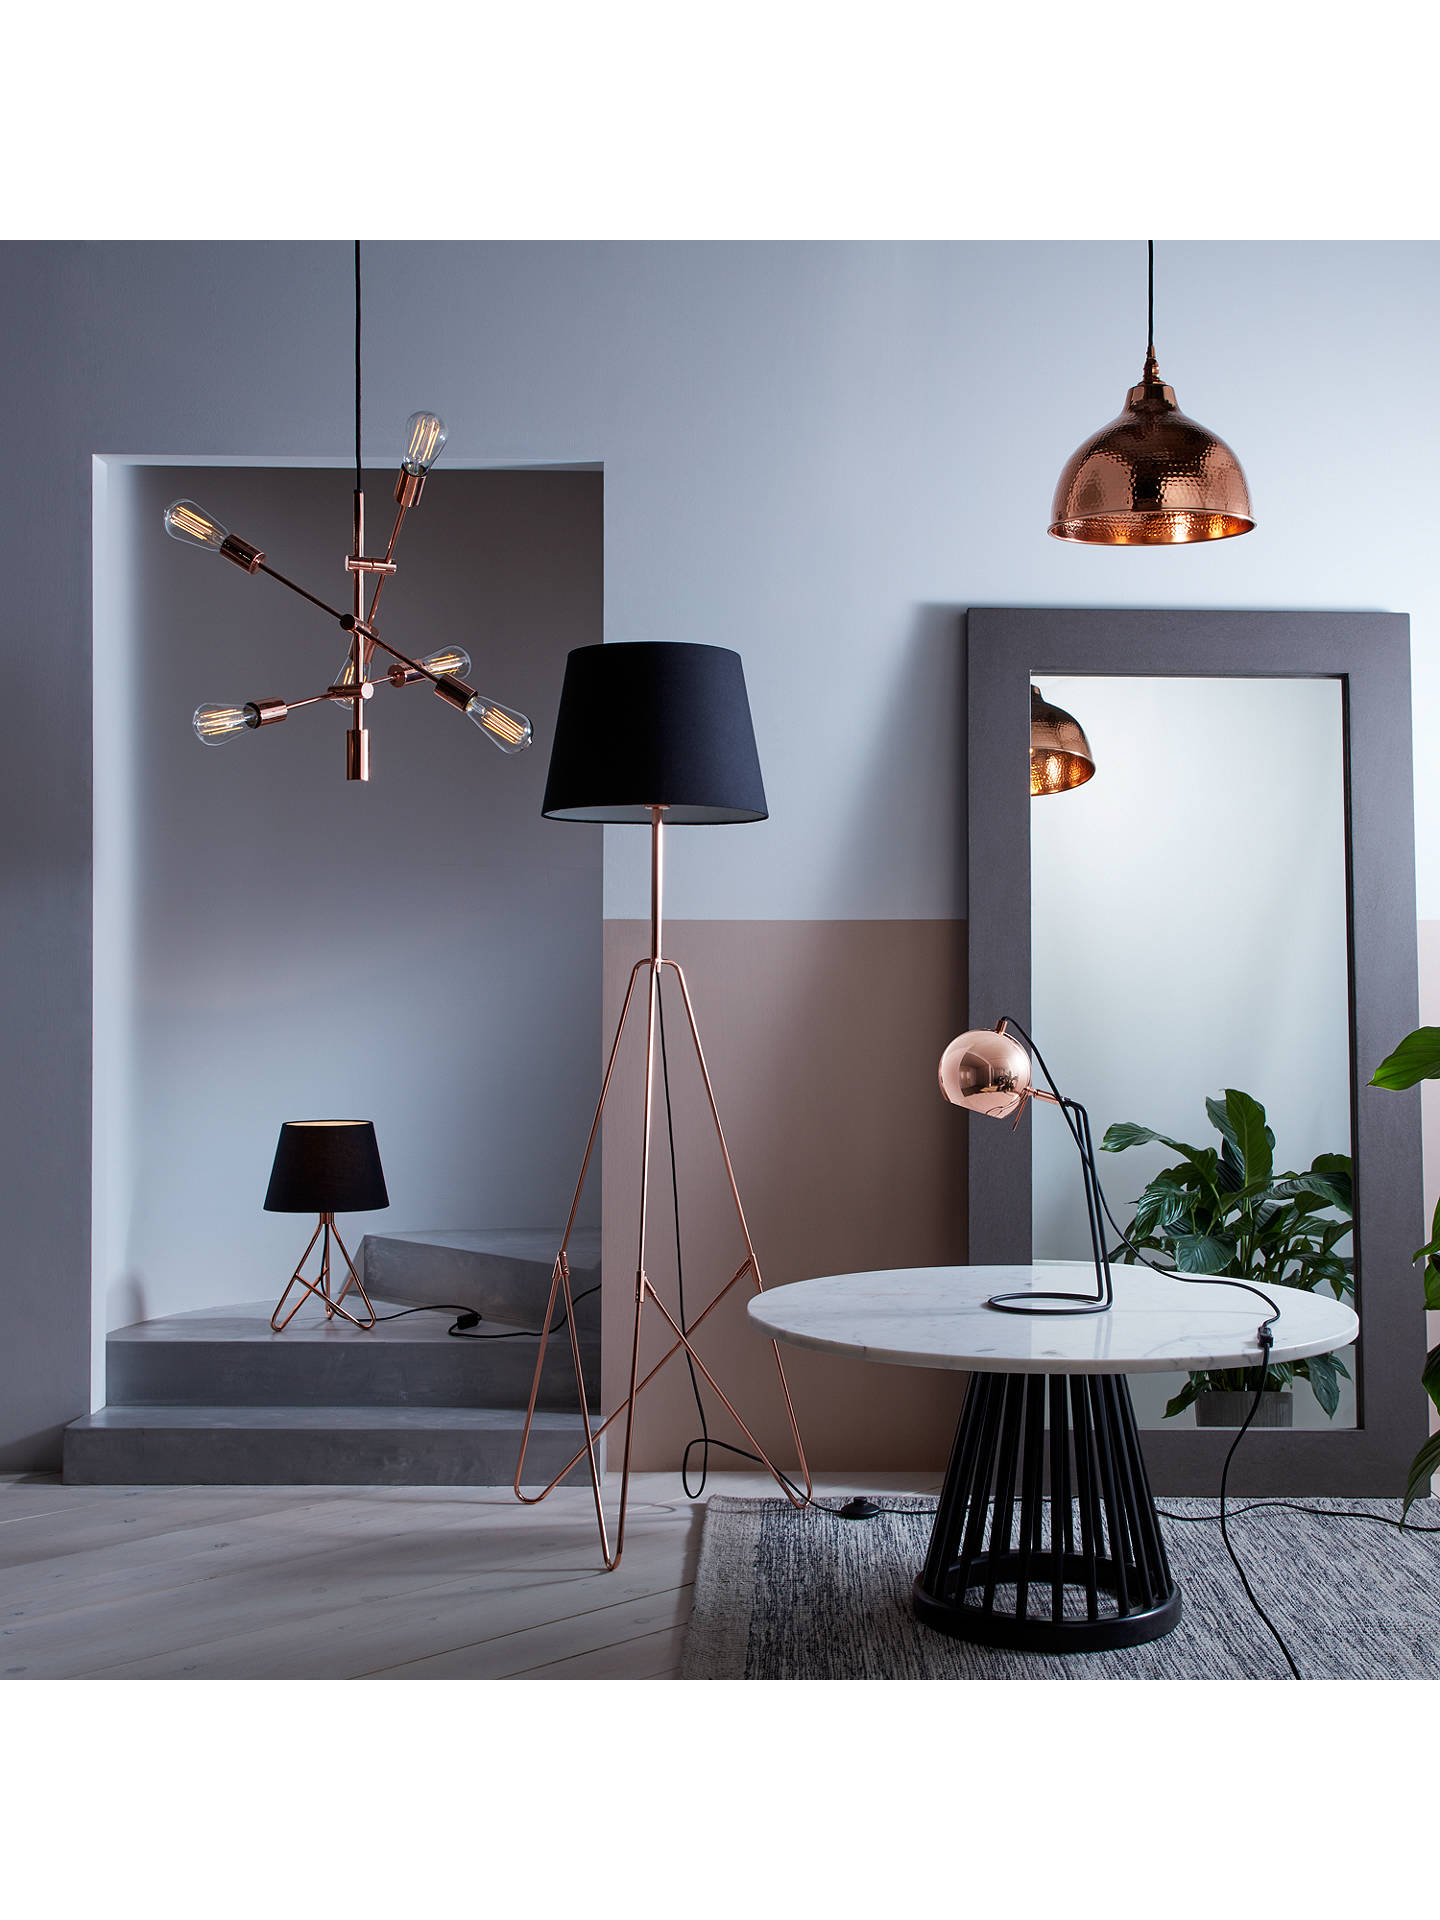 John Lewis & Partners Albus Twisted Table Lamp At John Lewis & Partners